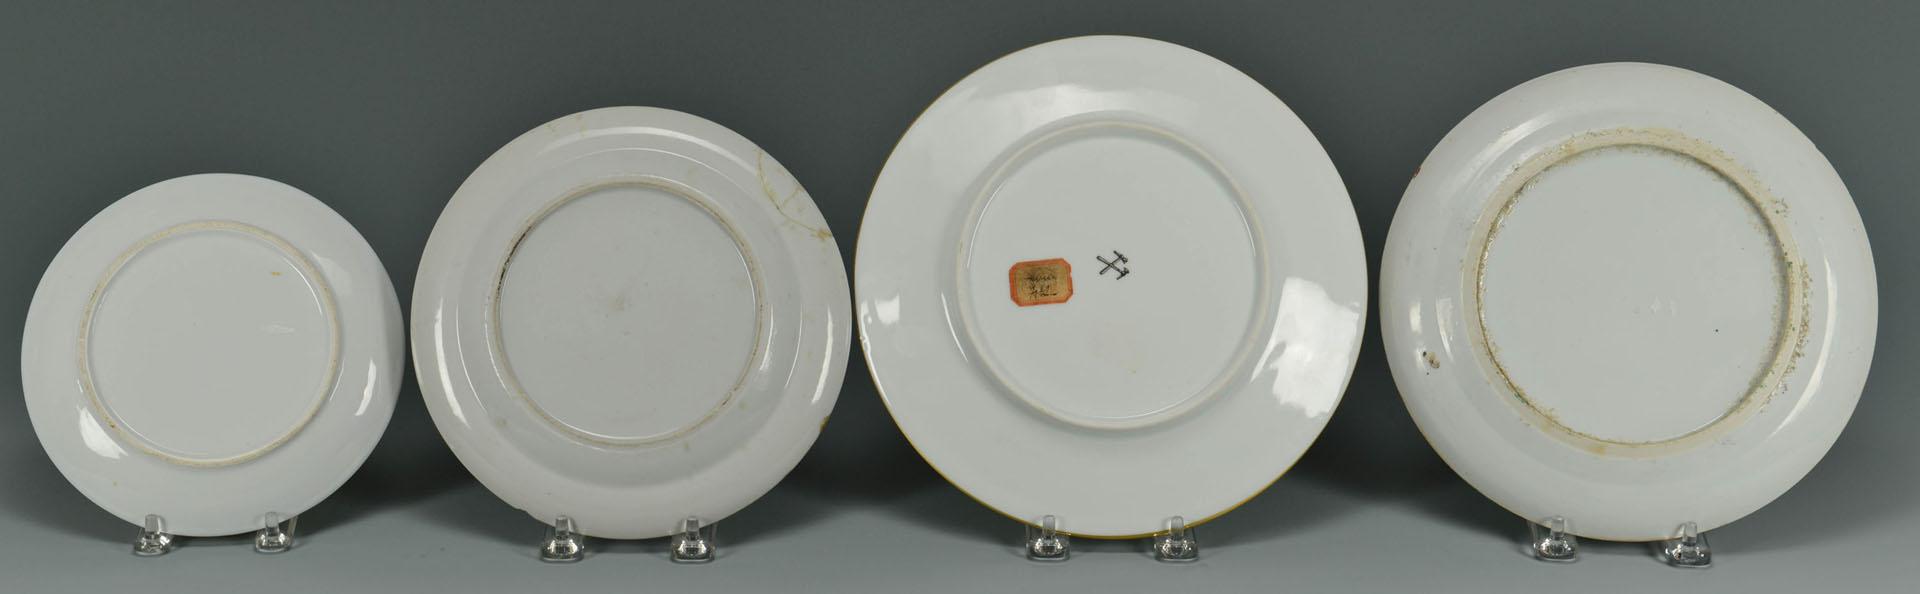 4 Asian Themed Porcelain Plates